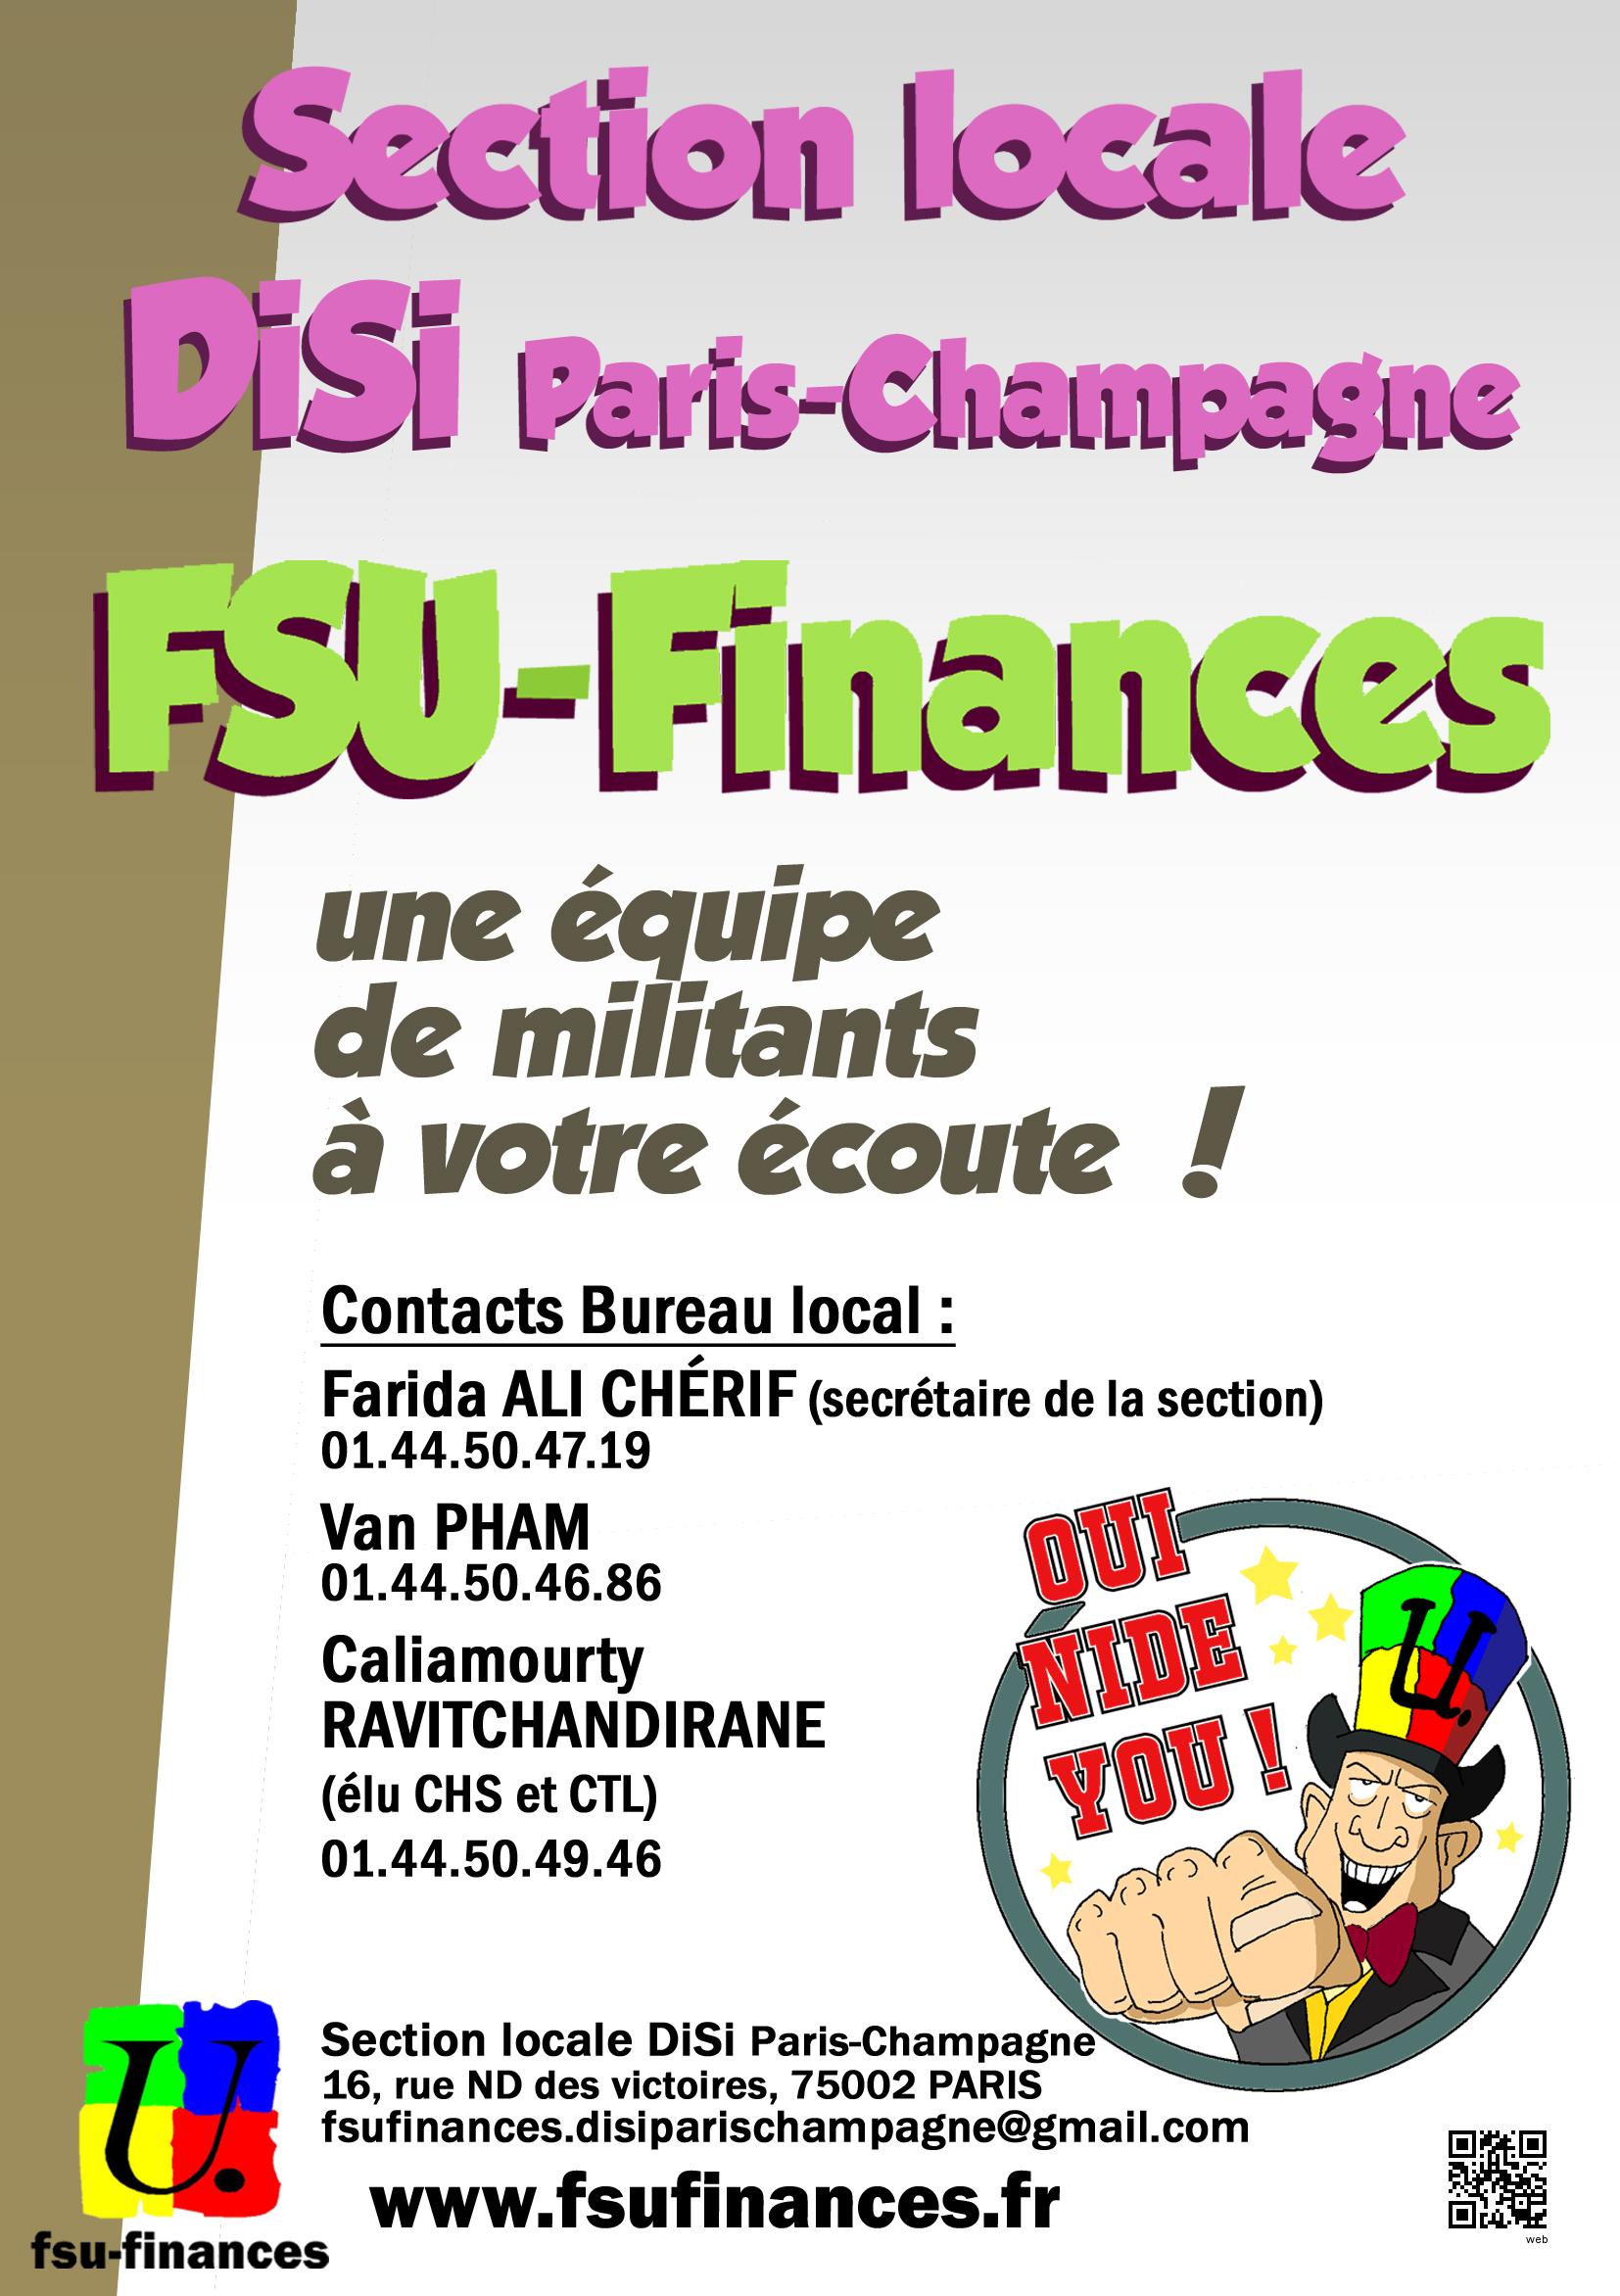 DISI PARIS CHAMPAGNE